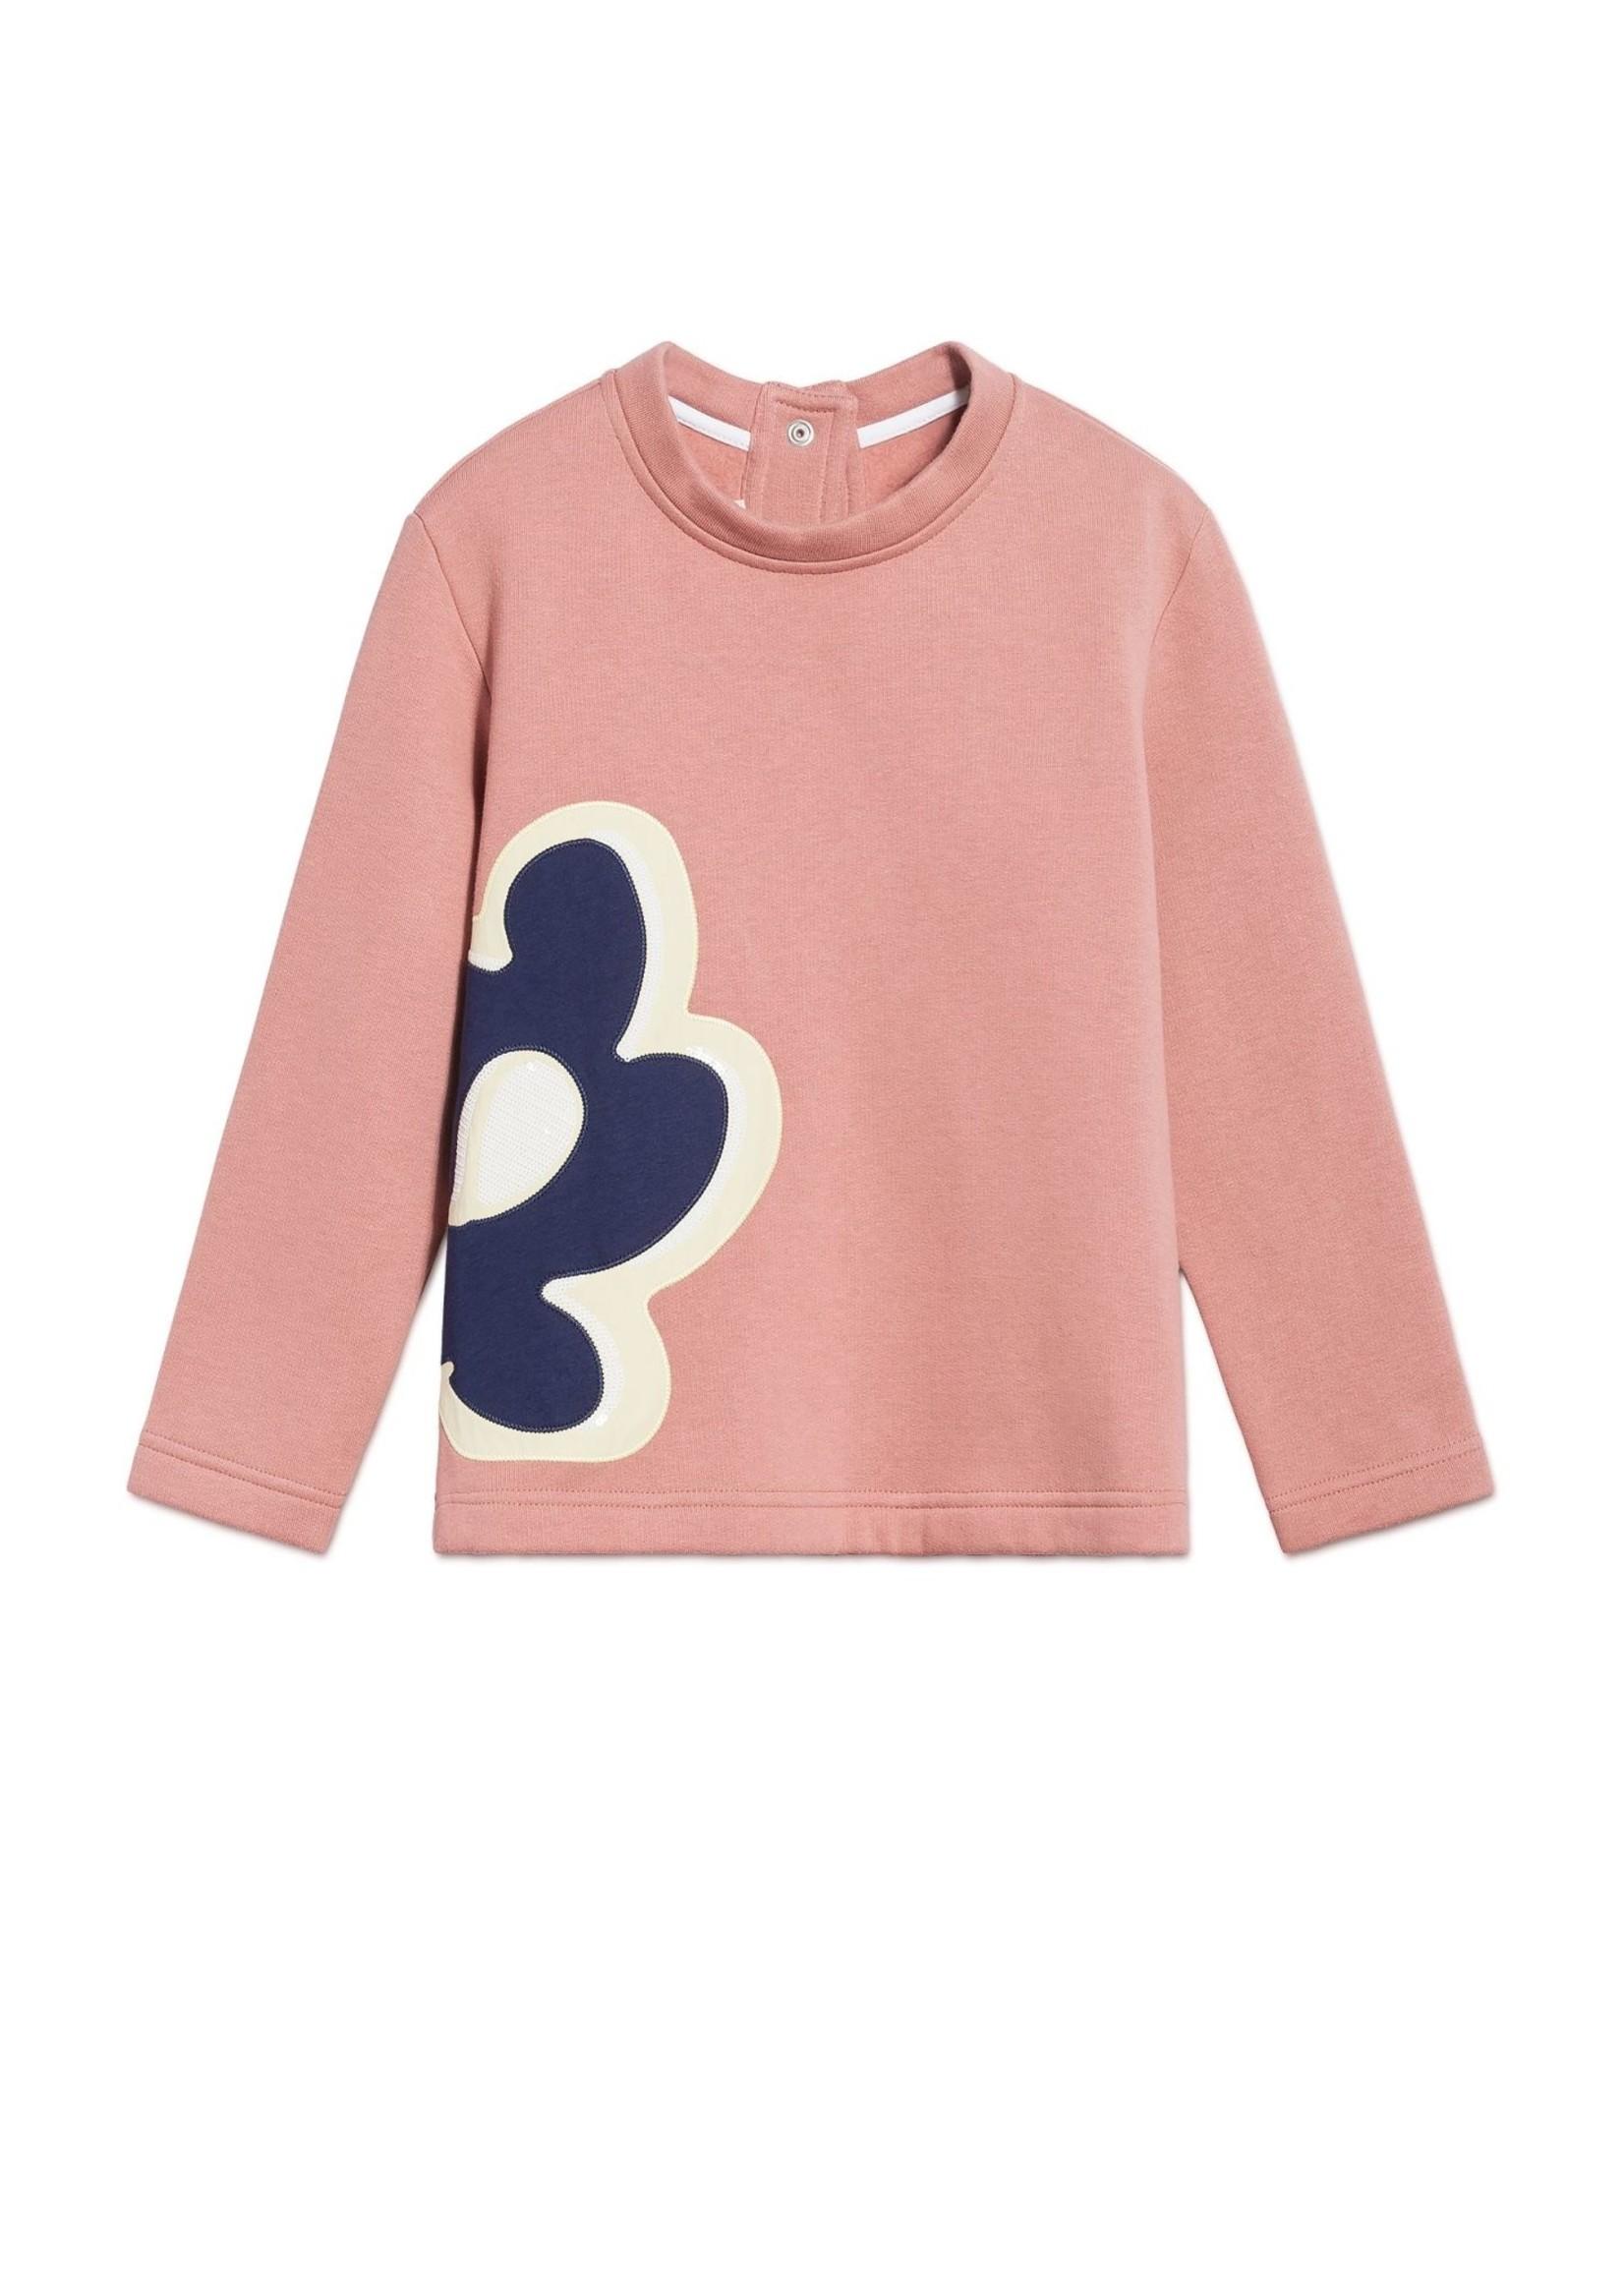 Marni Marni Girl Sweatshirt